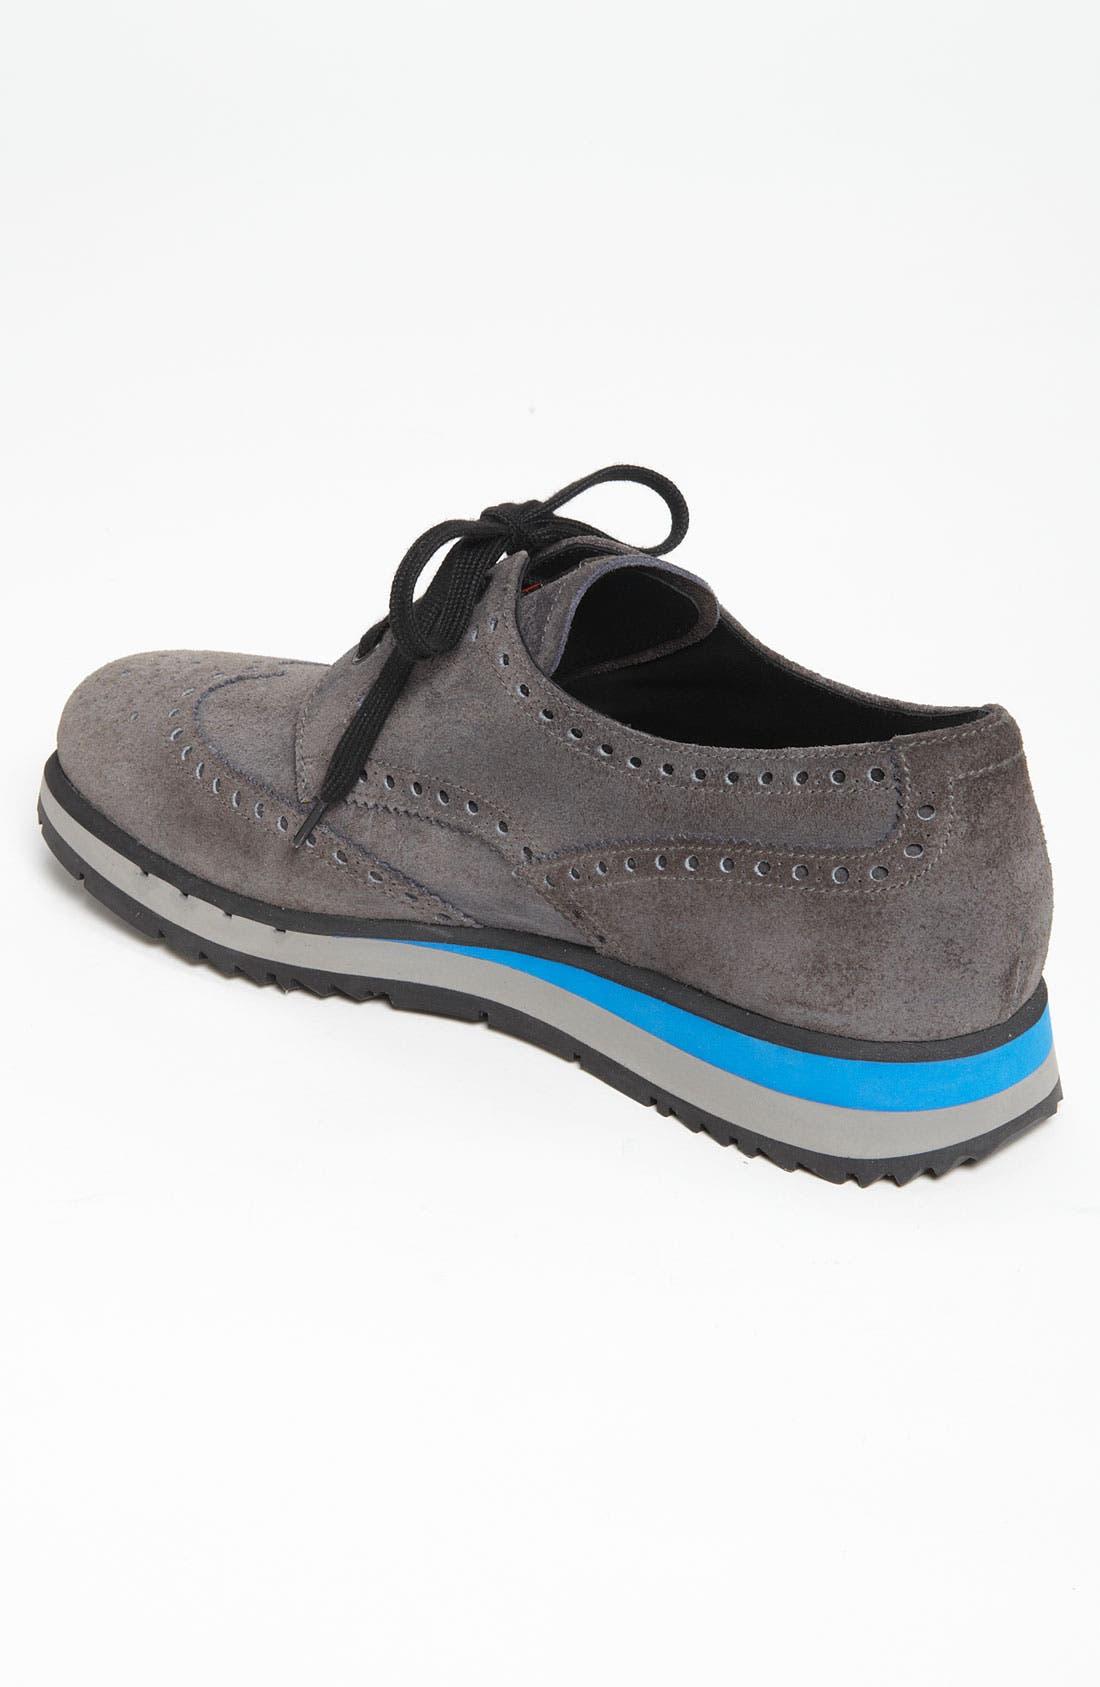 Wingtip Sneaker,                             Alternate thumbnail 2, color,                             020